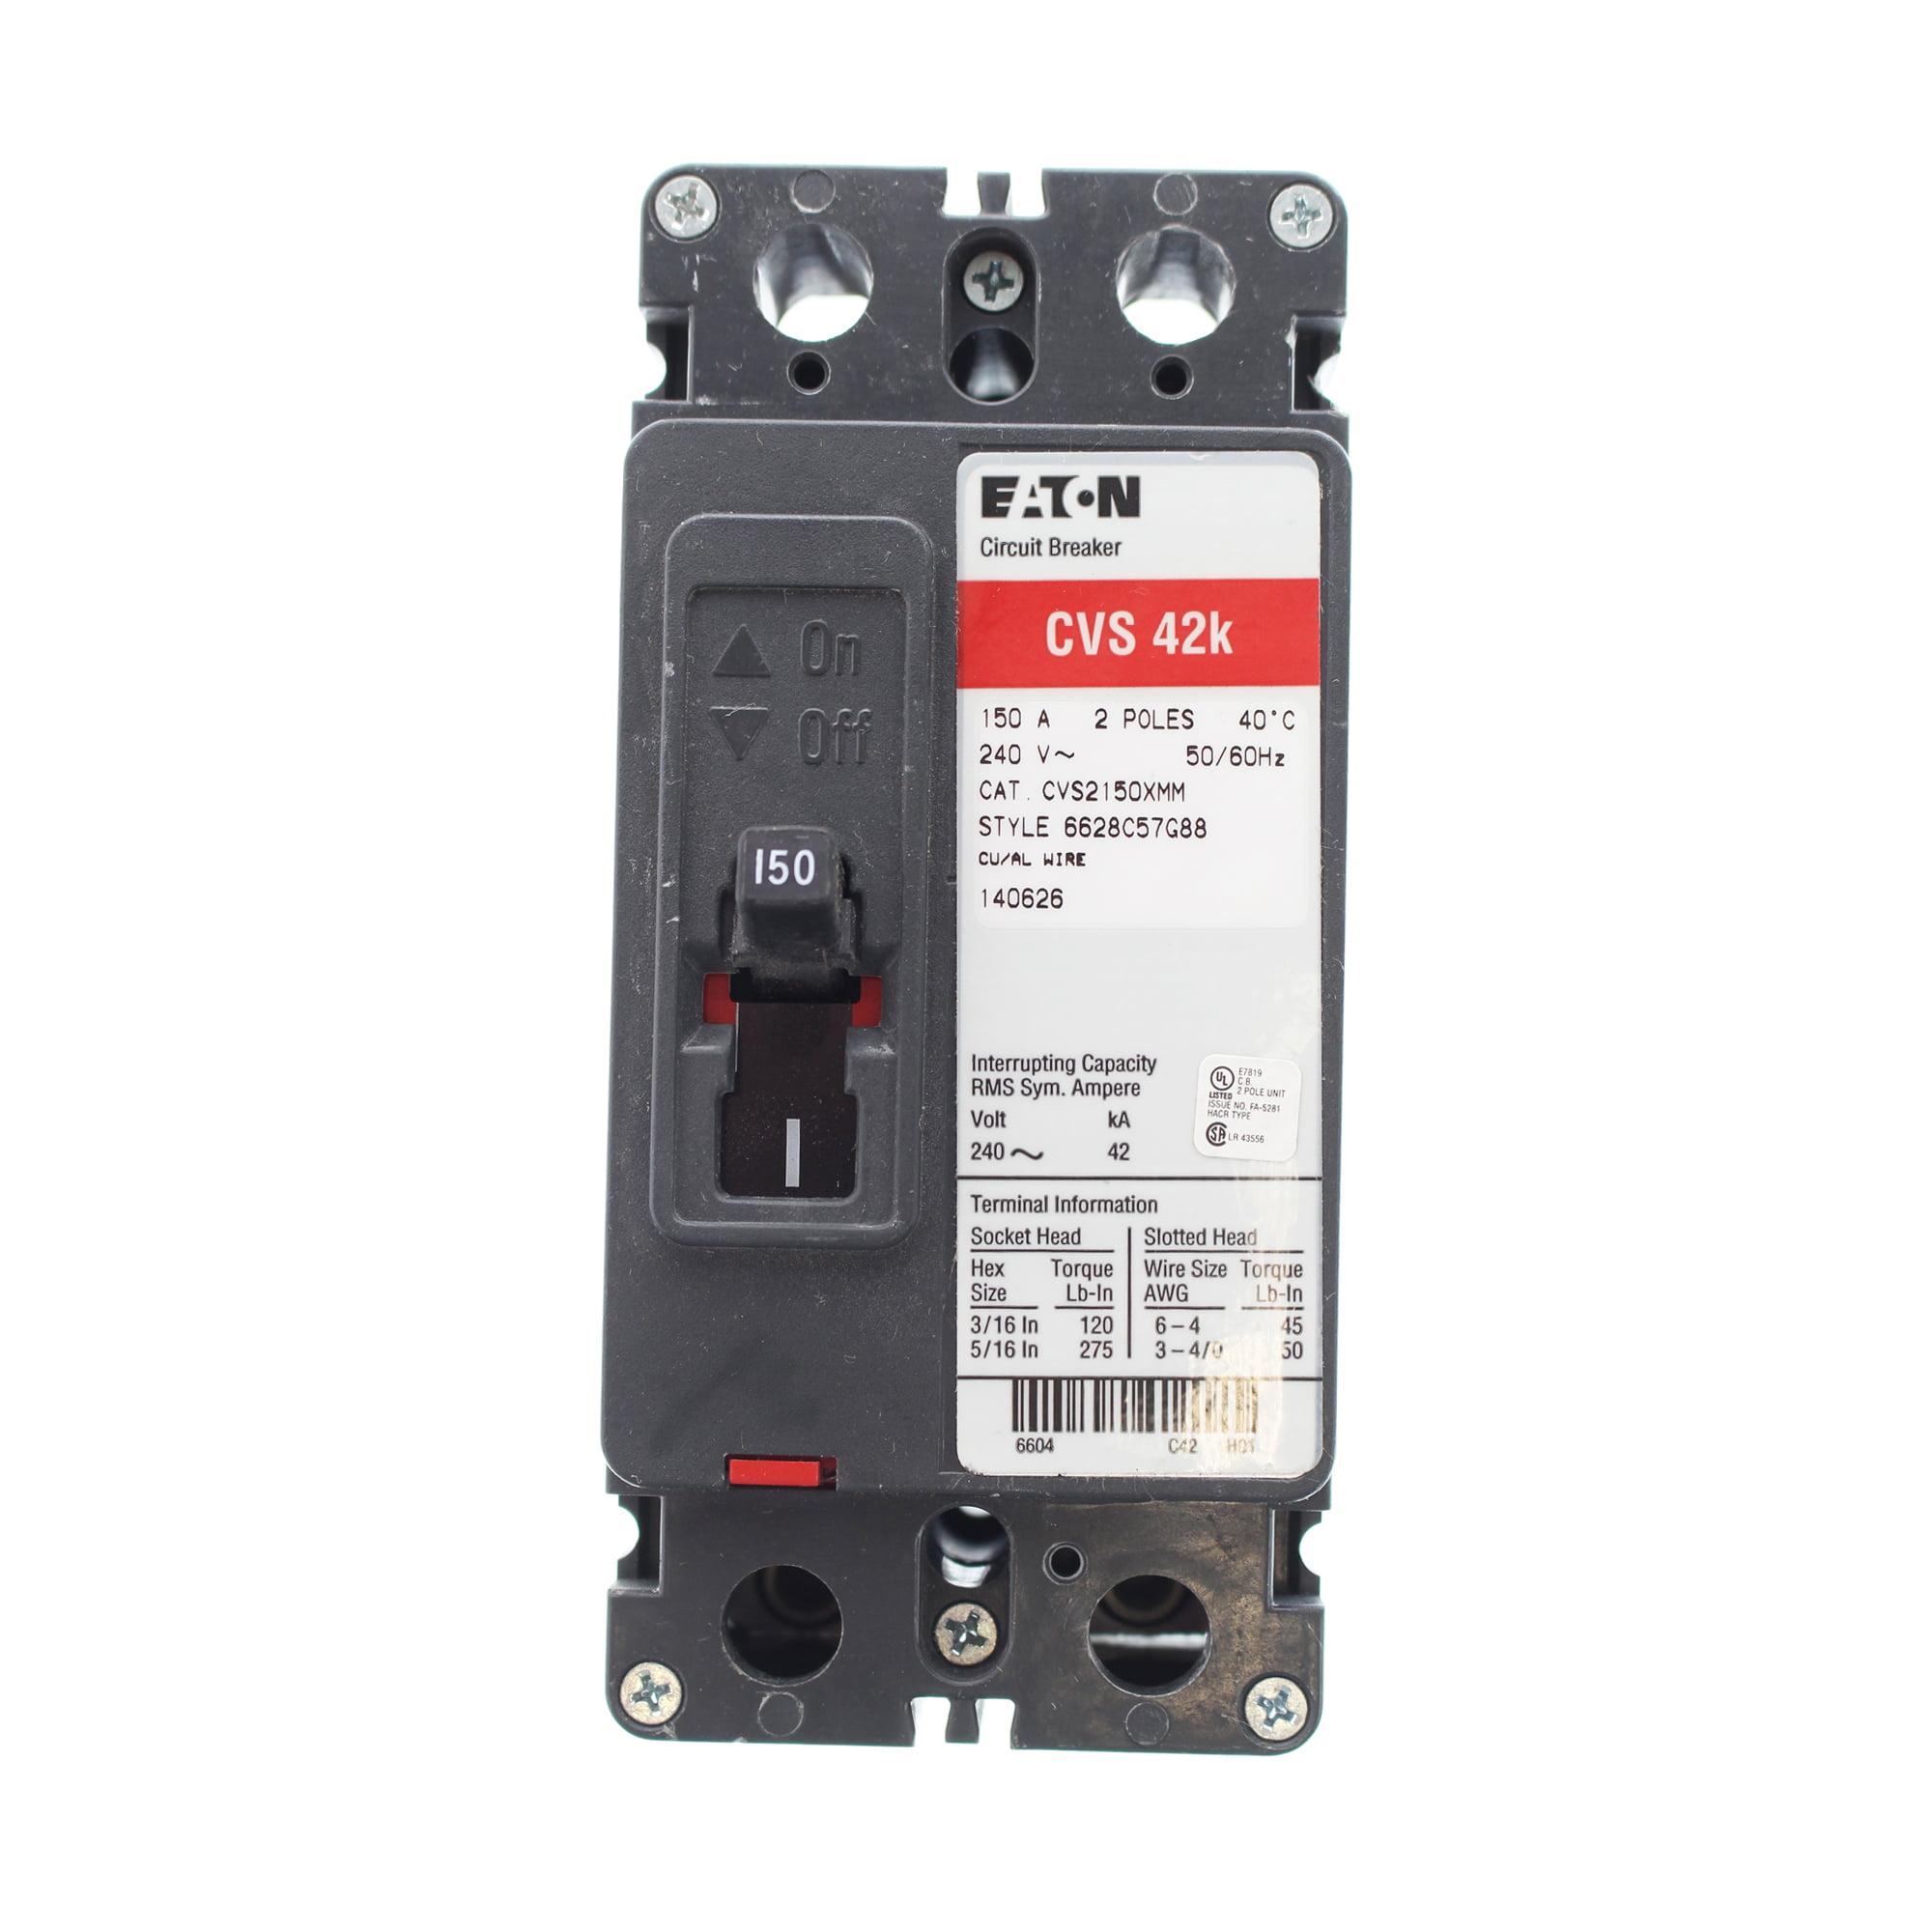 Cutler-Hammer CVS2150XMM Circuit Breaker, 240-Volt, 2-Pole, 150-Amp, 42kAIC, CV